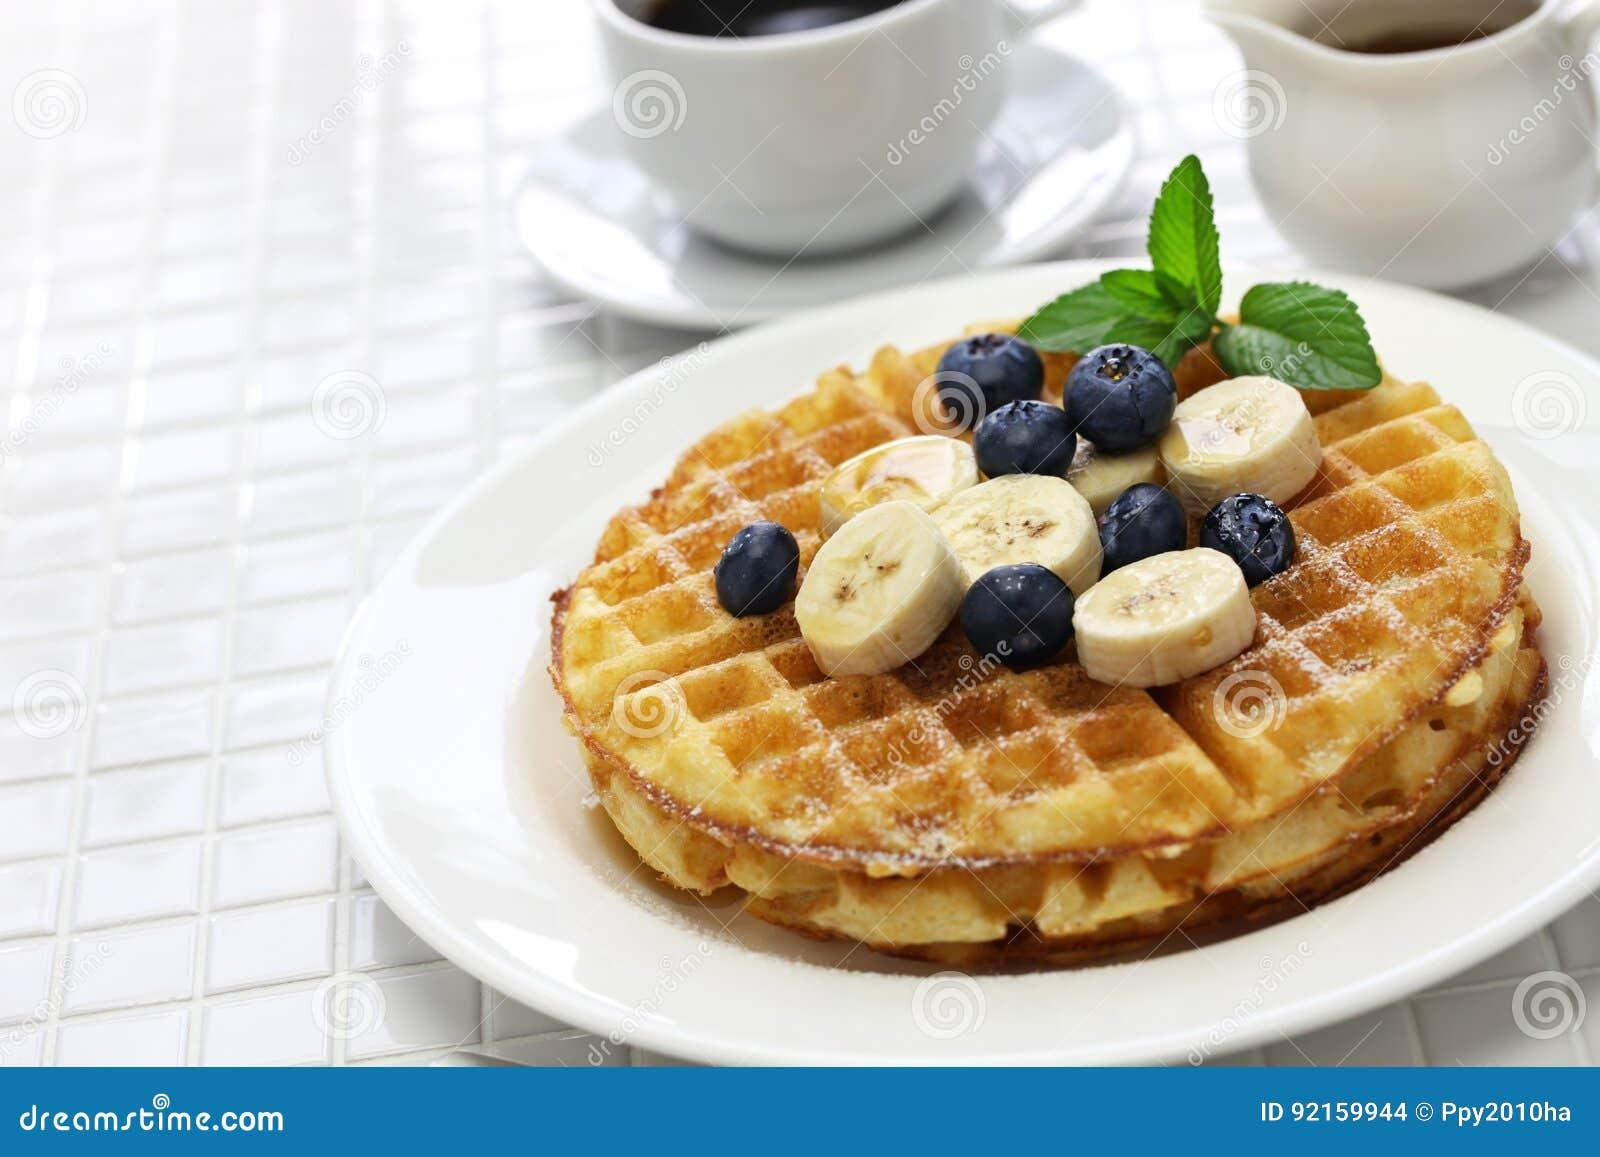 Homemade american round waffles